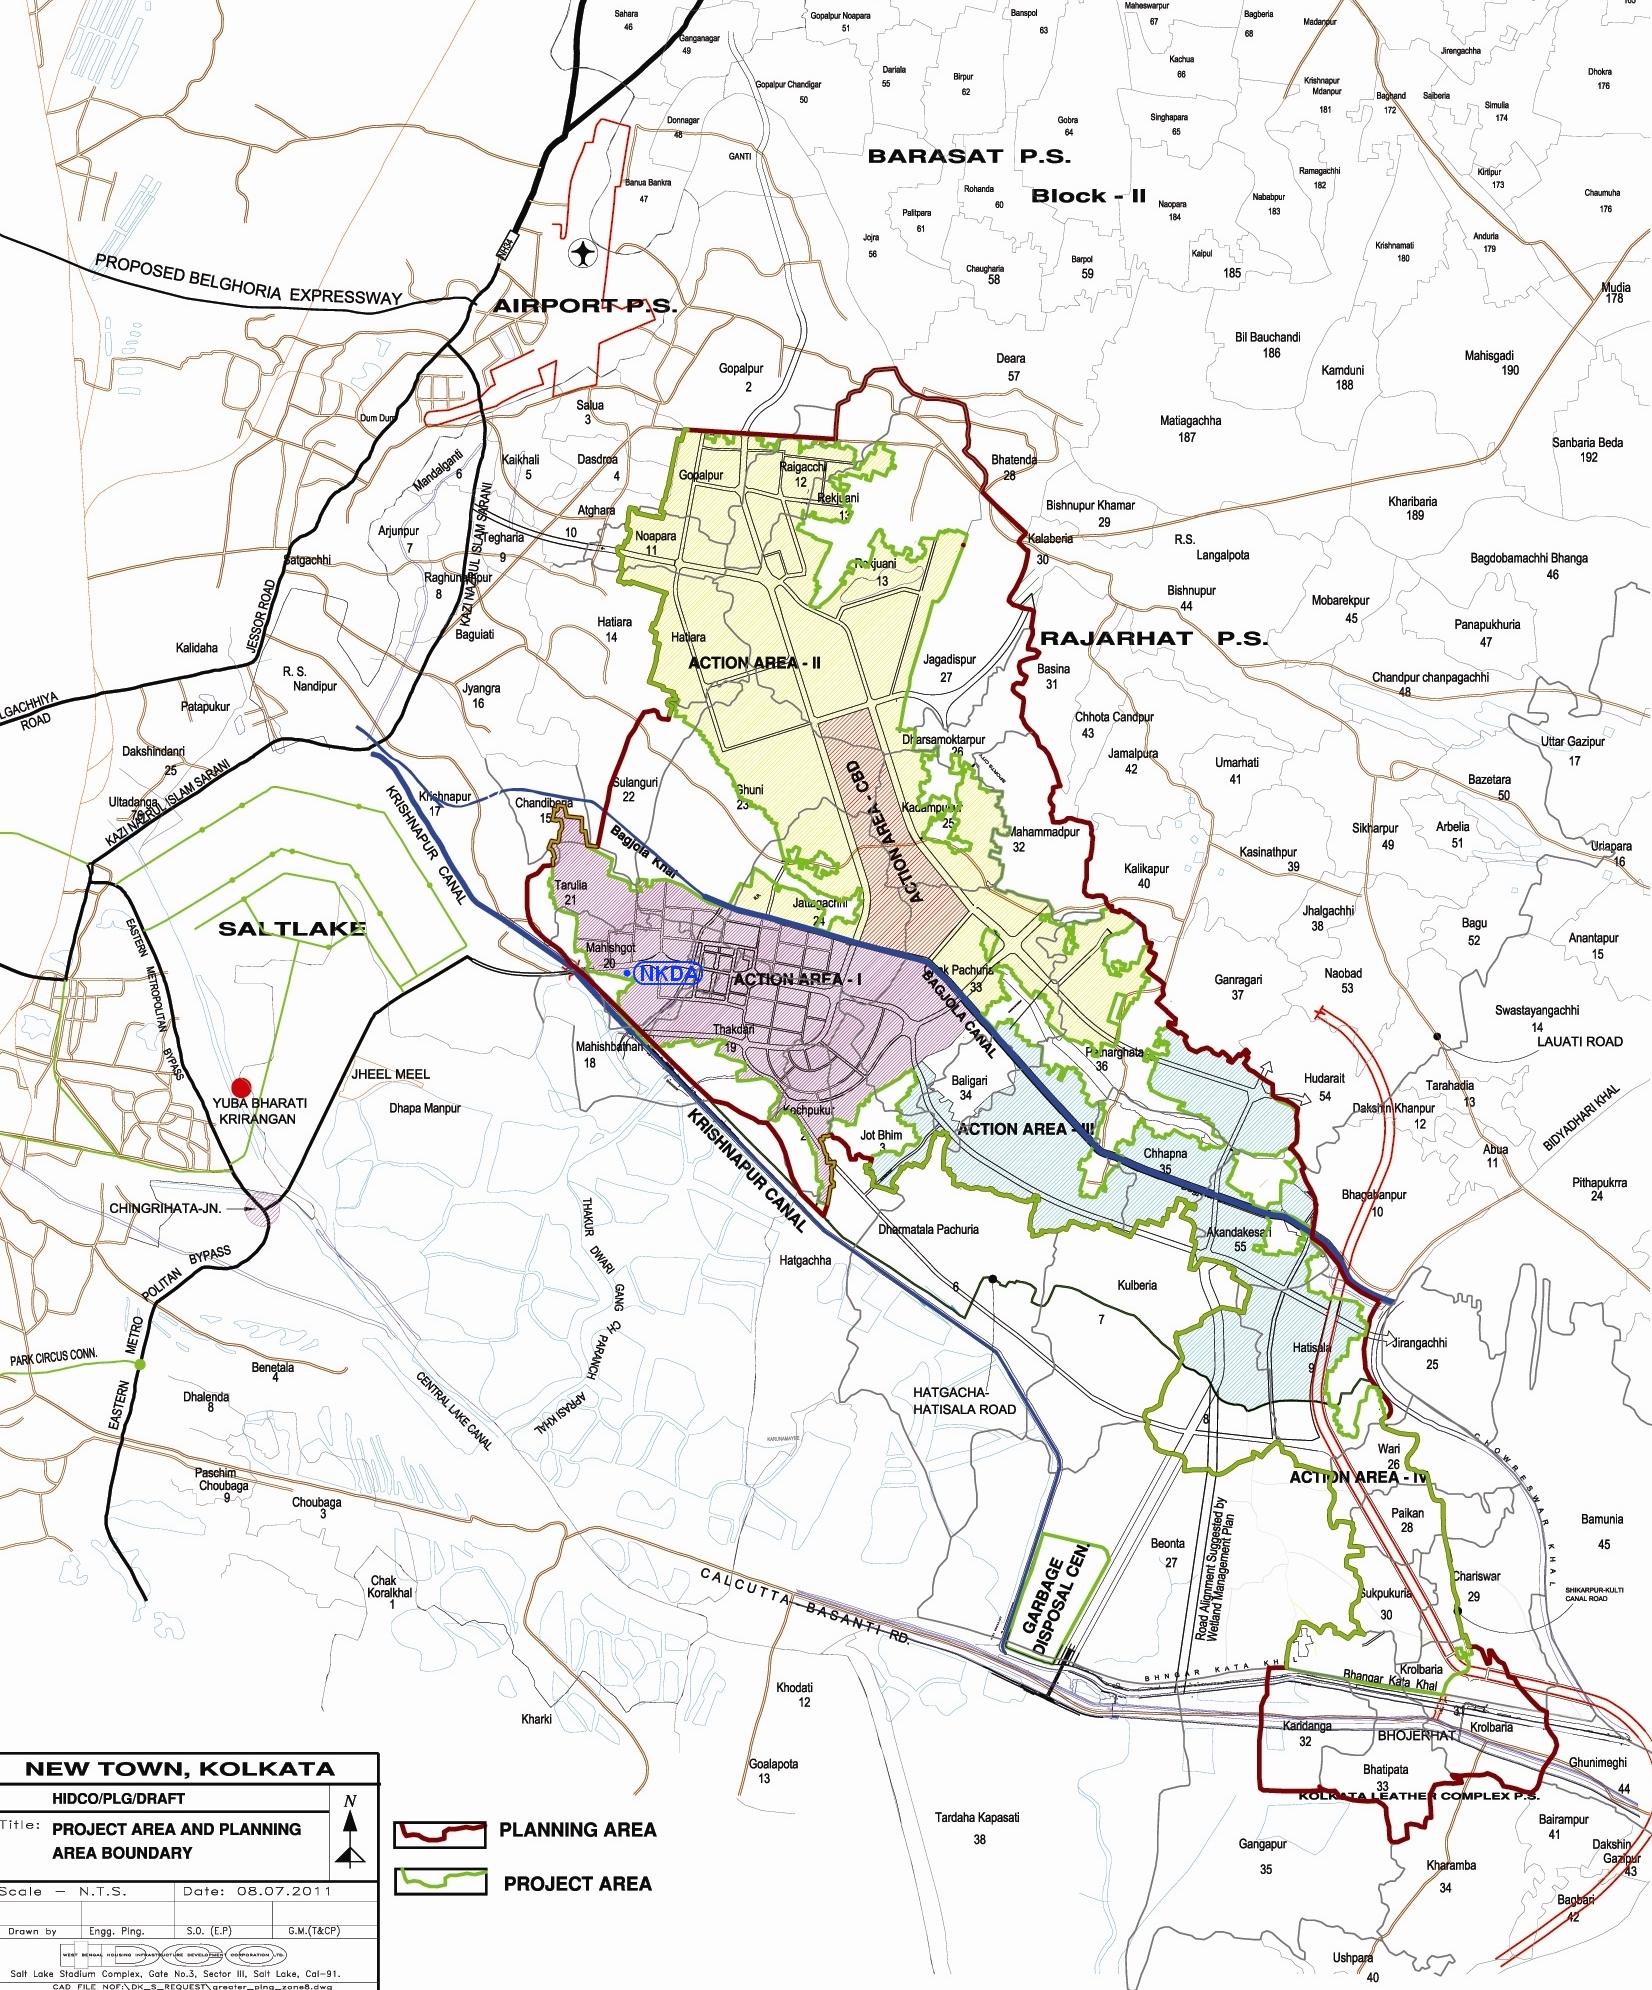 Map - NewTown Kolkata Development Authority Kolkata Map on andaman islands map, amritsar map, gobi desert map, dhaka map, mumbai map, myanmar map, bangalore map, jaipur map, beijing map, seoul map, bangladesh map, west bengal map, asia map, cairo map, colombo map, indus river map, delhi map, calcutta map, chennai on map, varanasi map,